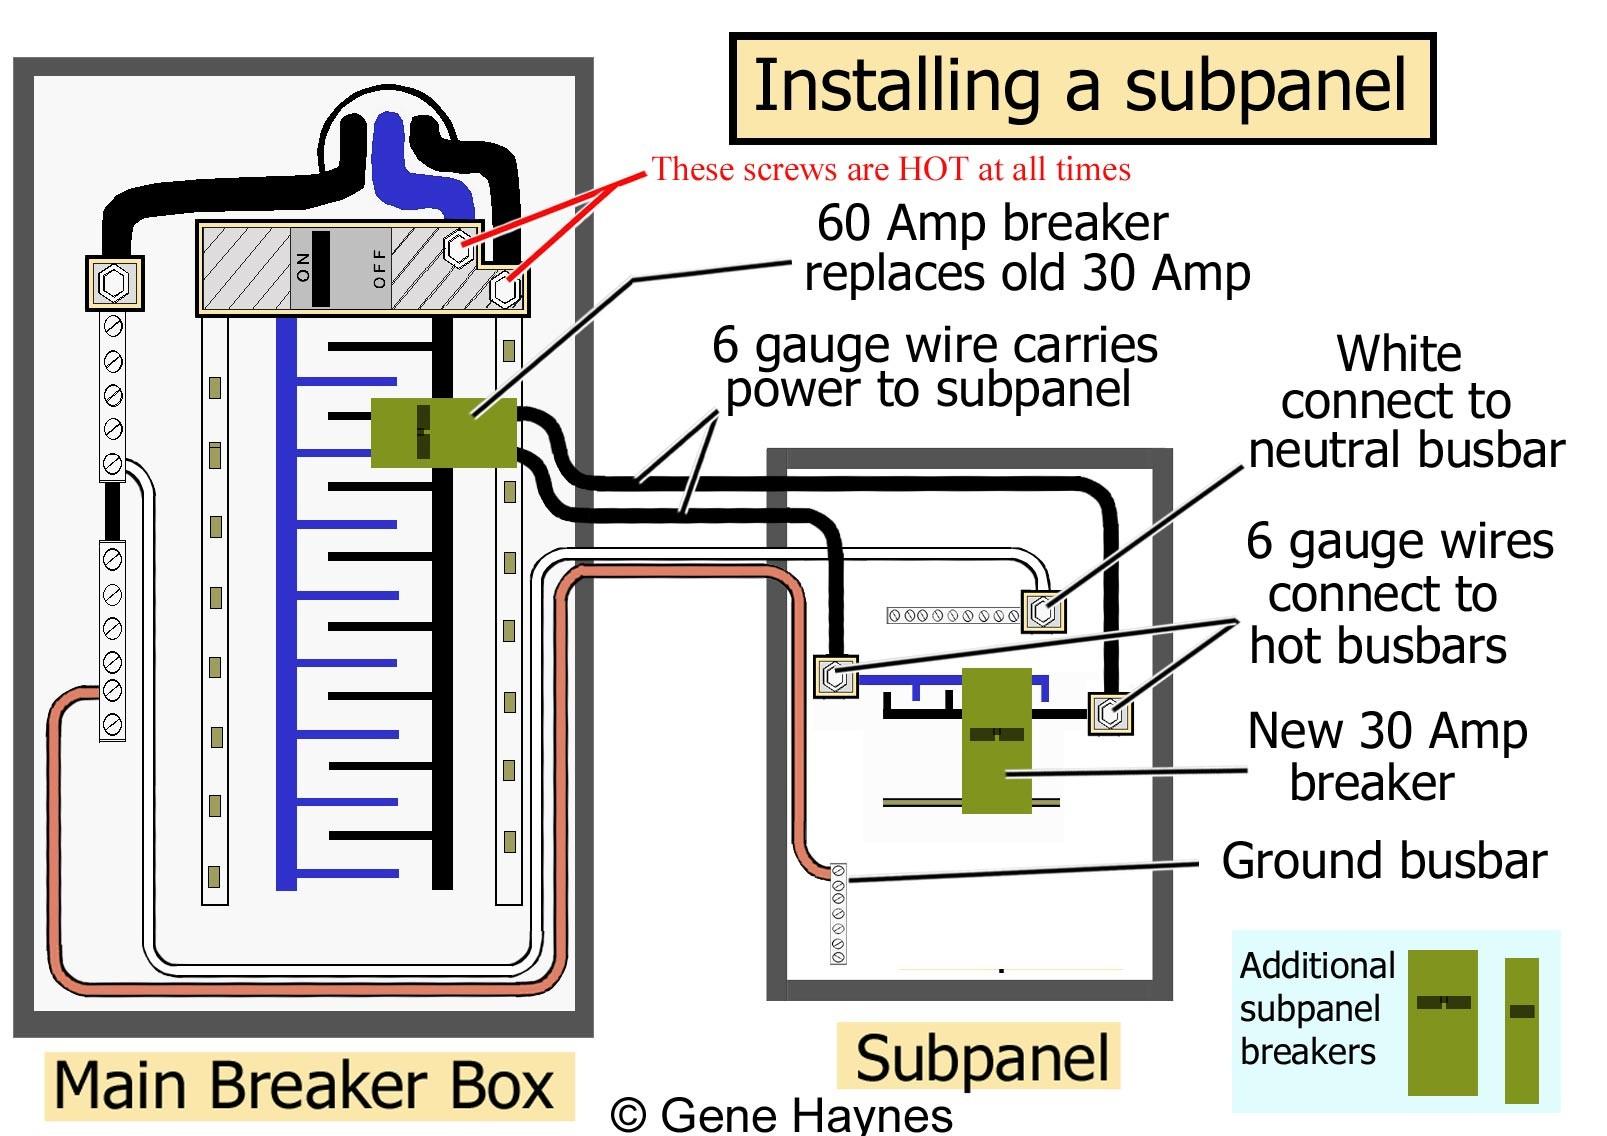 1 60 150 Amp breaker replaces any 240 breaker in main box near top of box